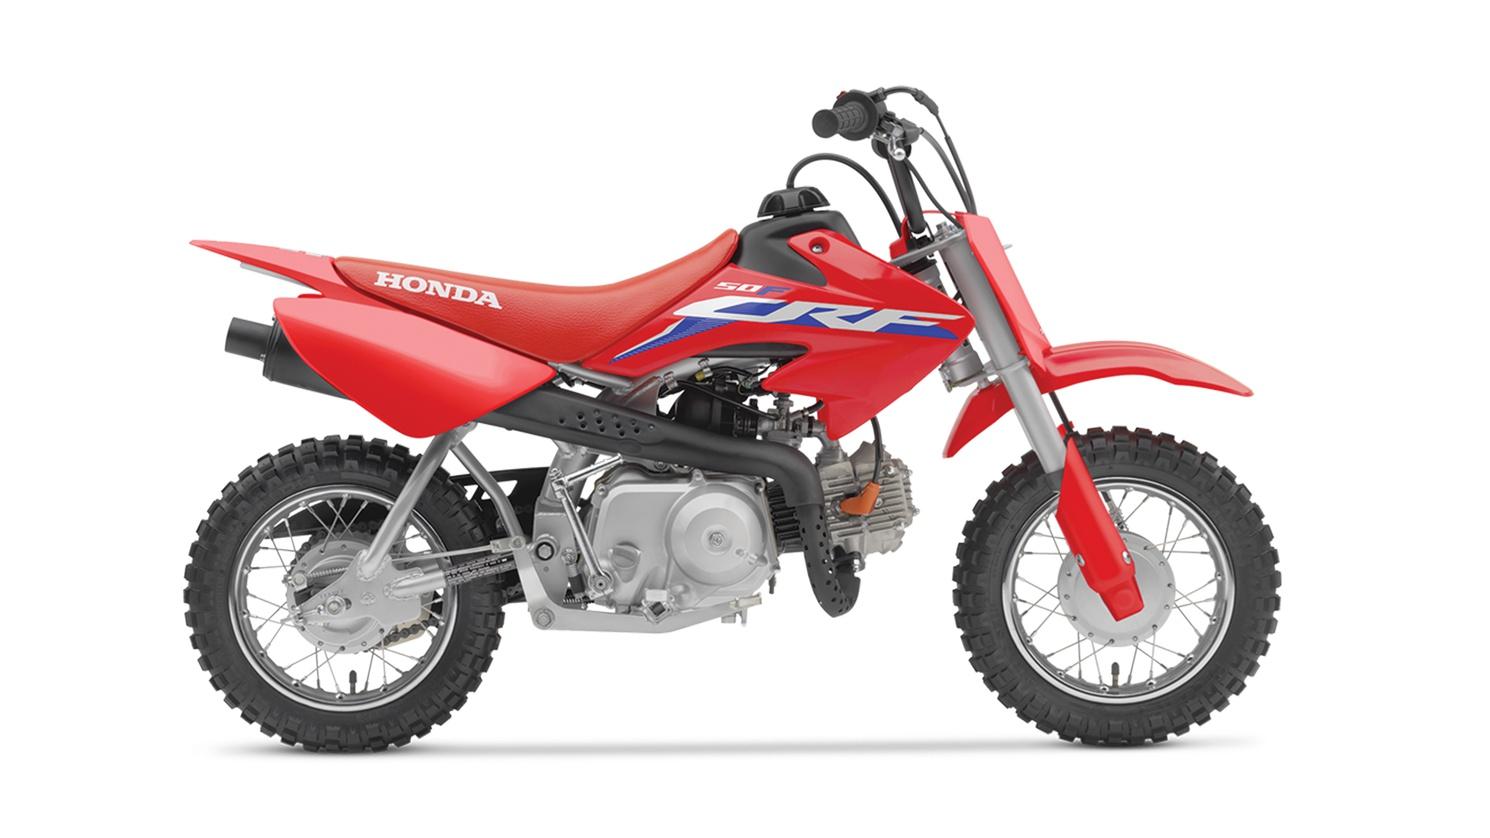 2022 Honda CRF50F Frais inclus+Taxes